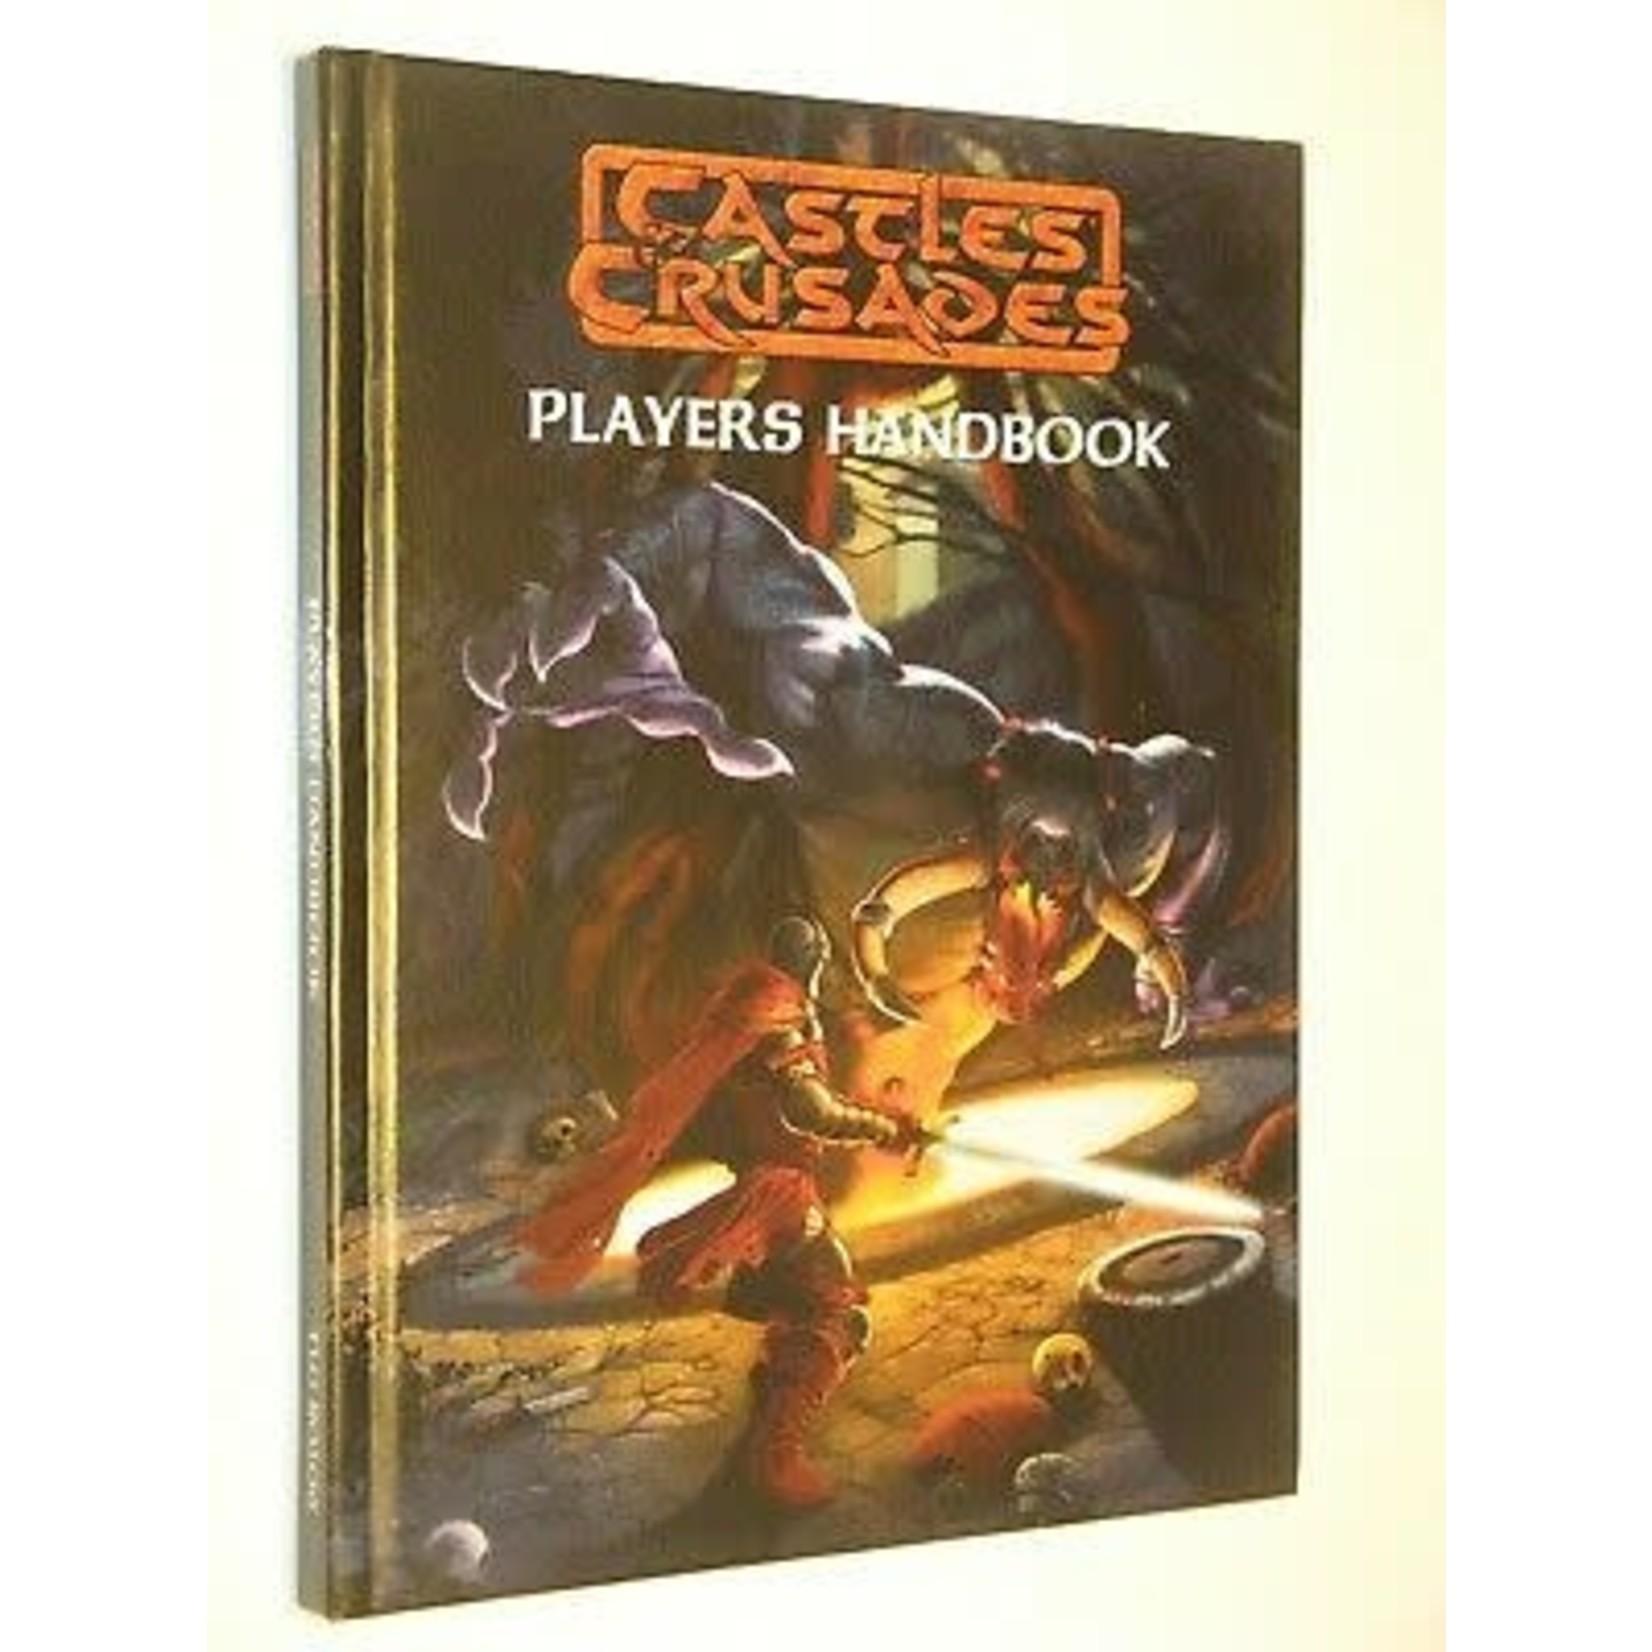 Castles & Crusades RPG Player's Handbook